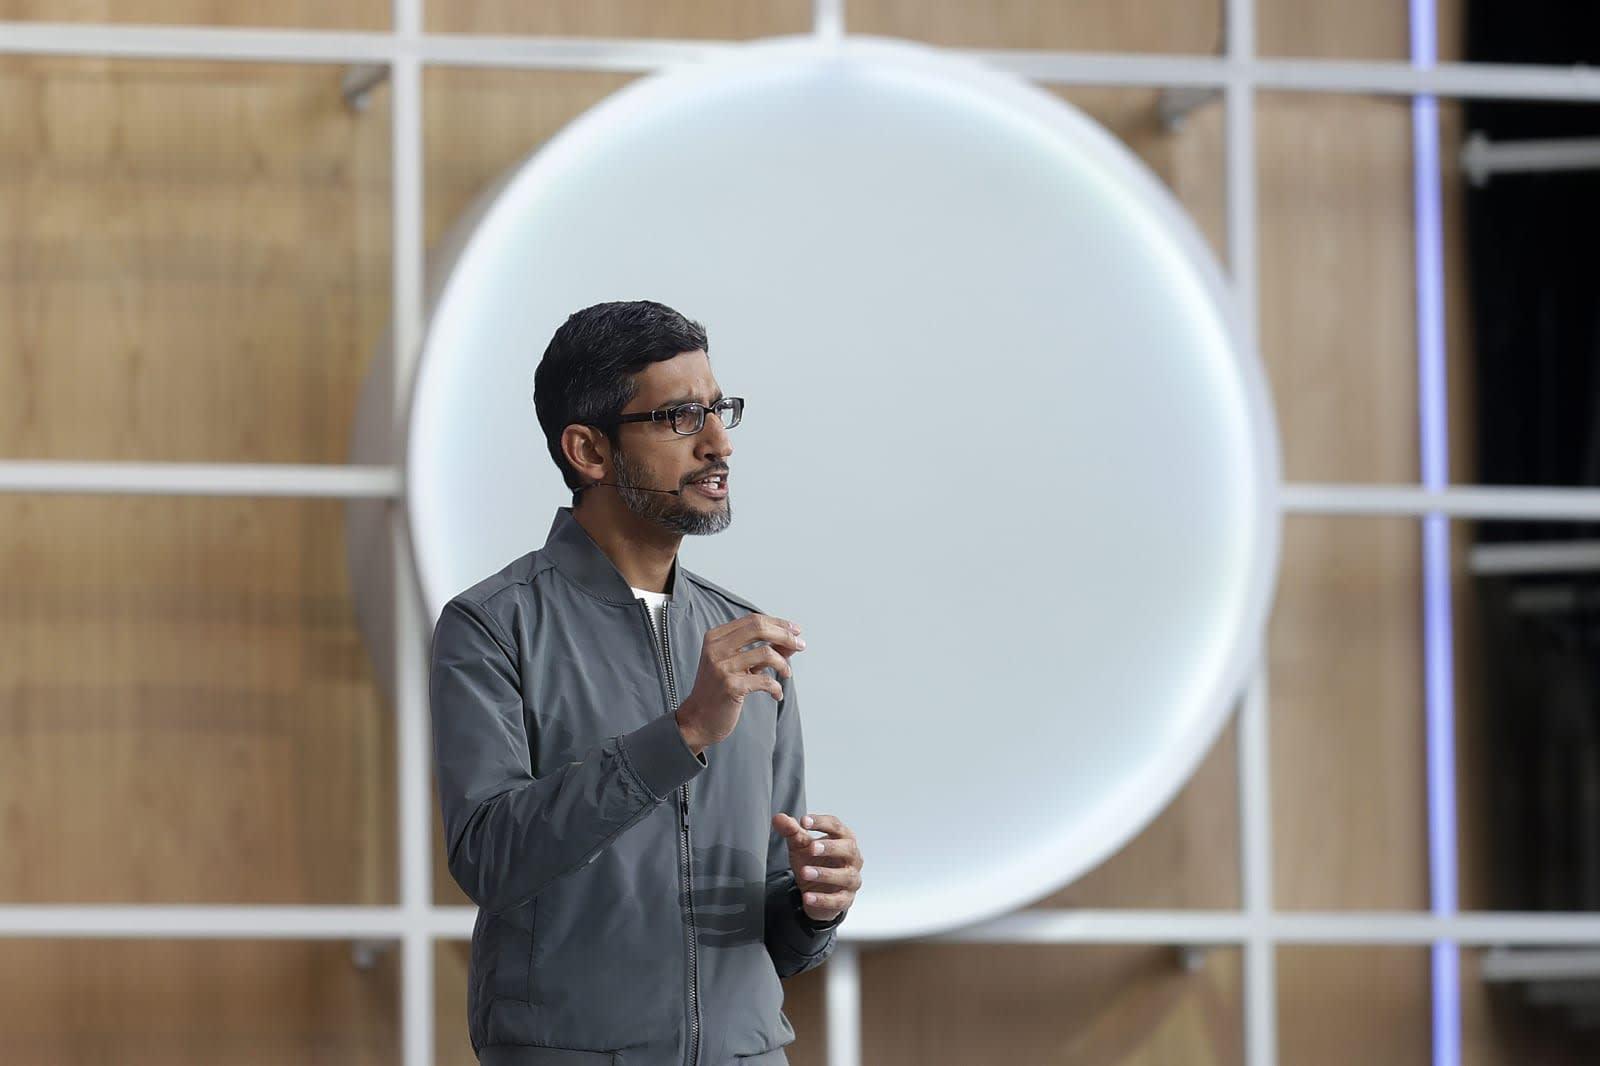 Google scales back town hall meetings following leaks